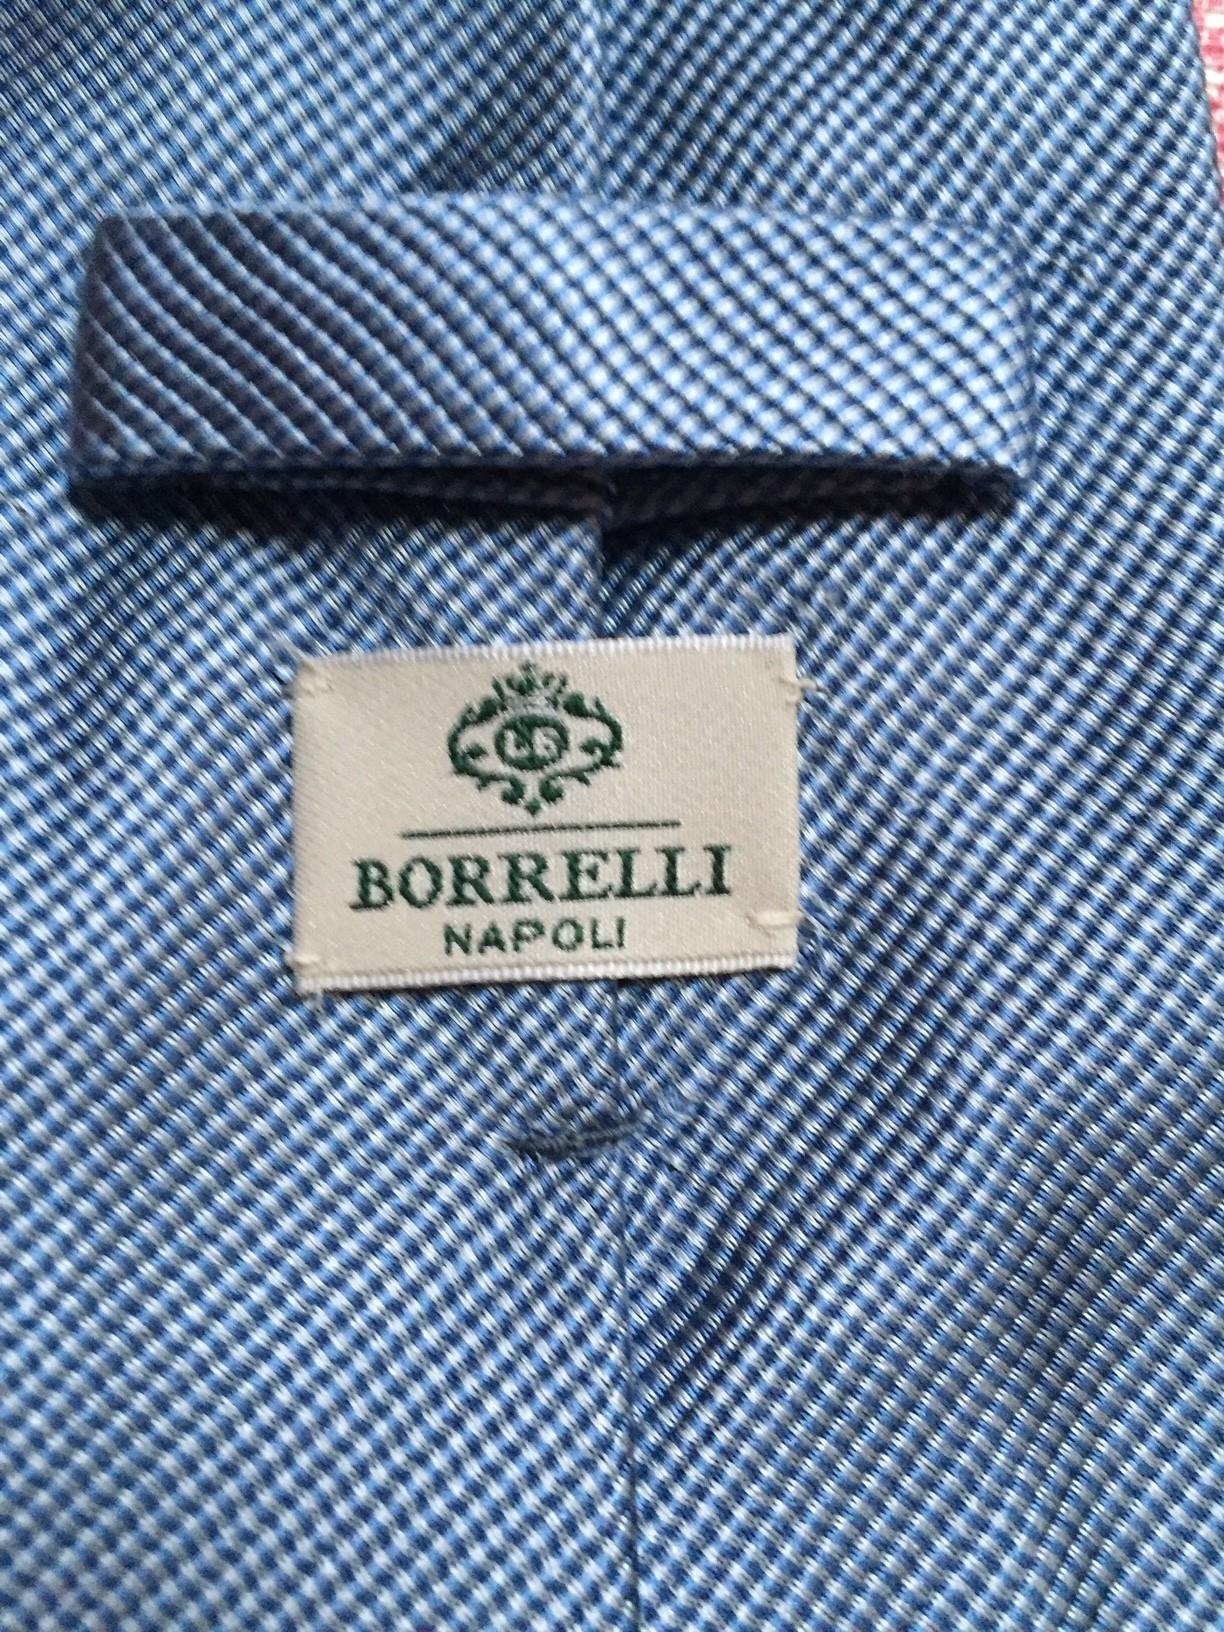 Borrelli Label 2 (New?)